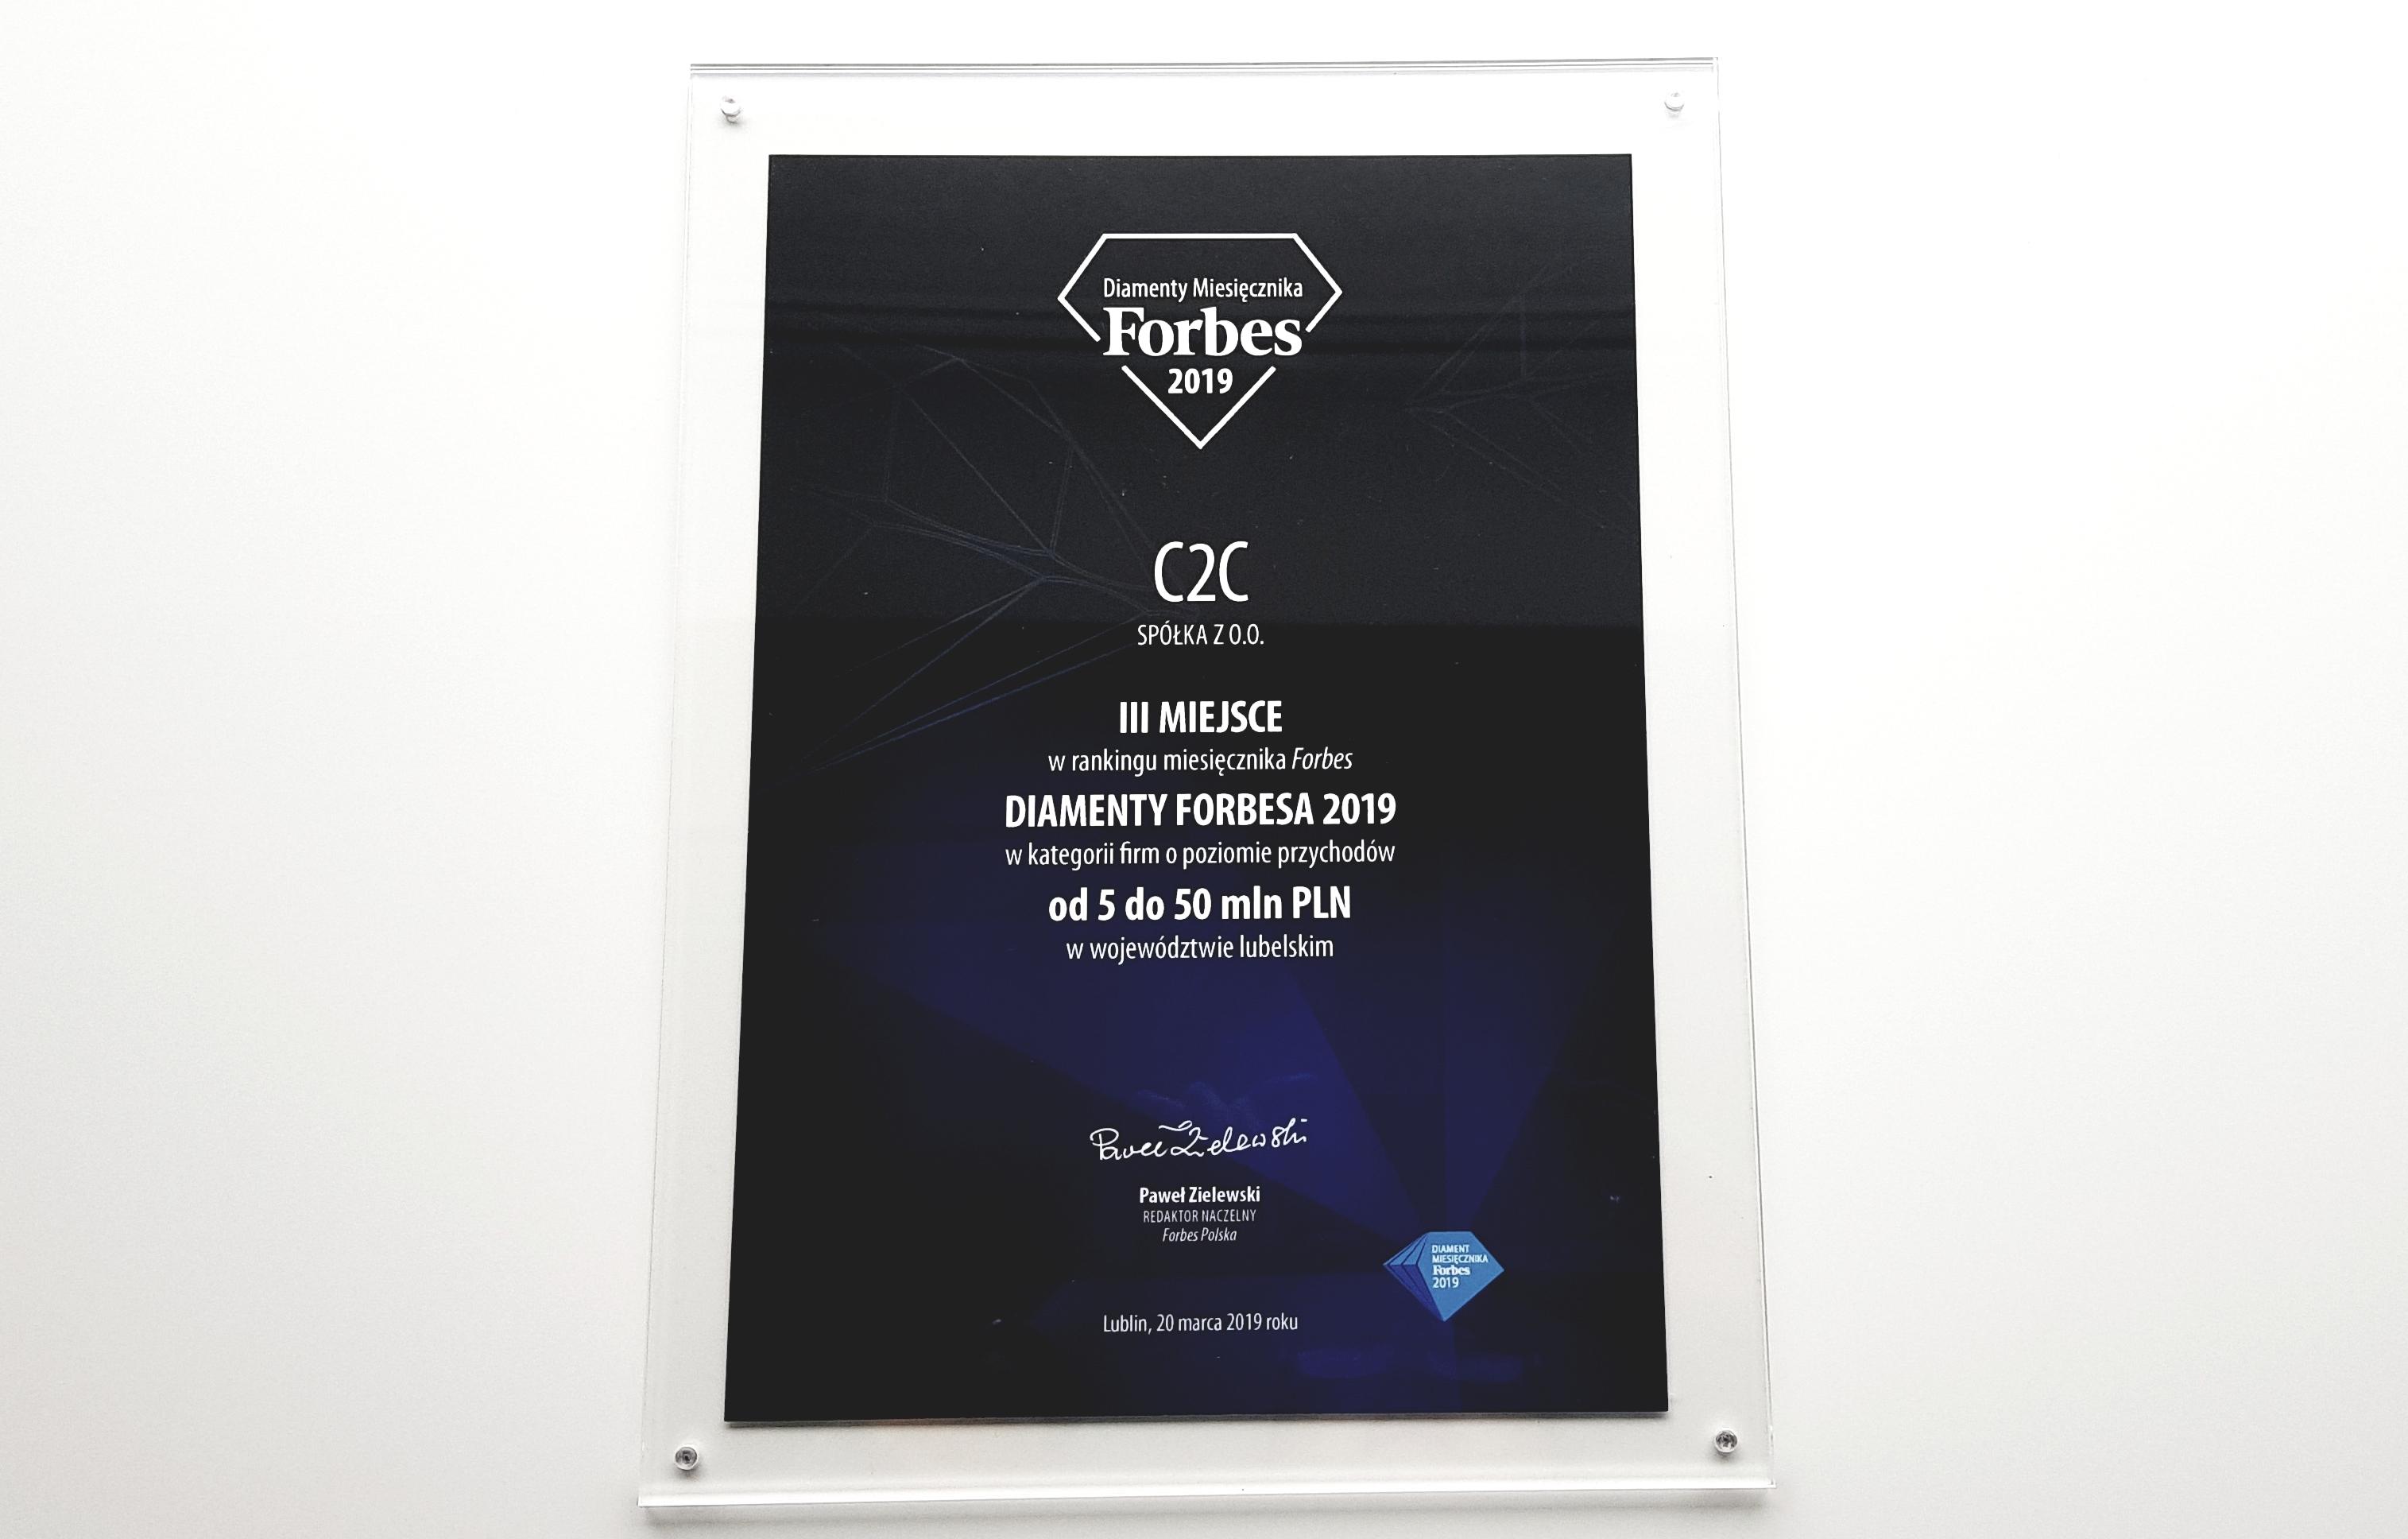 The framed prize Forbes Diamonds 2019 for company C2C sp. z o. o. o.